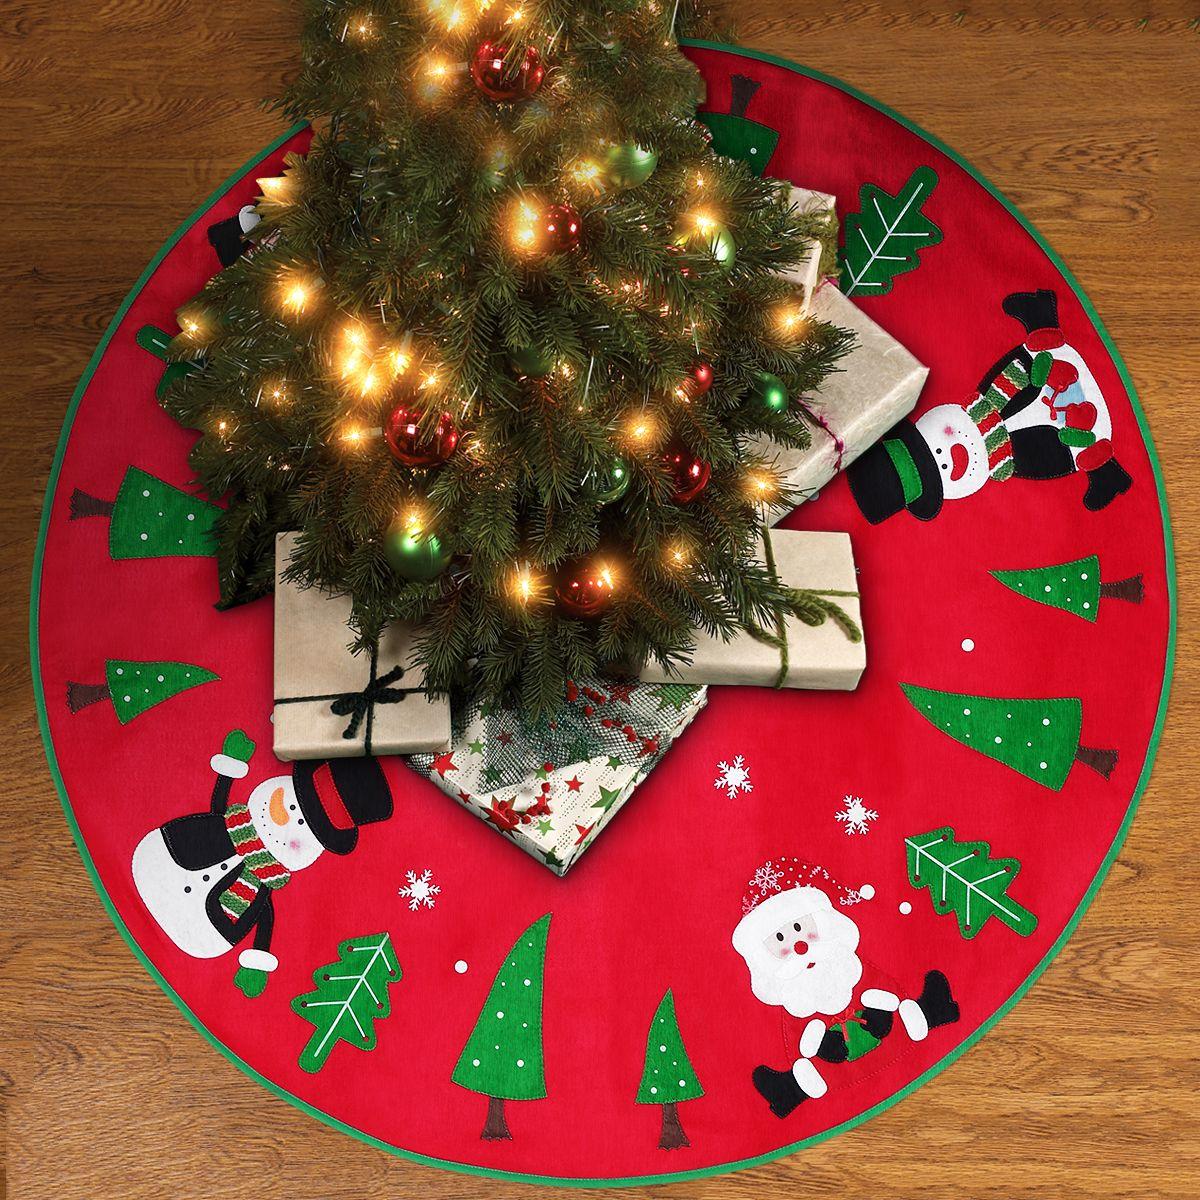 Christmas Tree Skirt Reindeer, Snowman, Christmas Tree